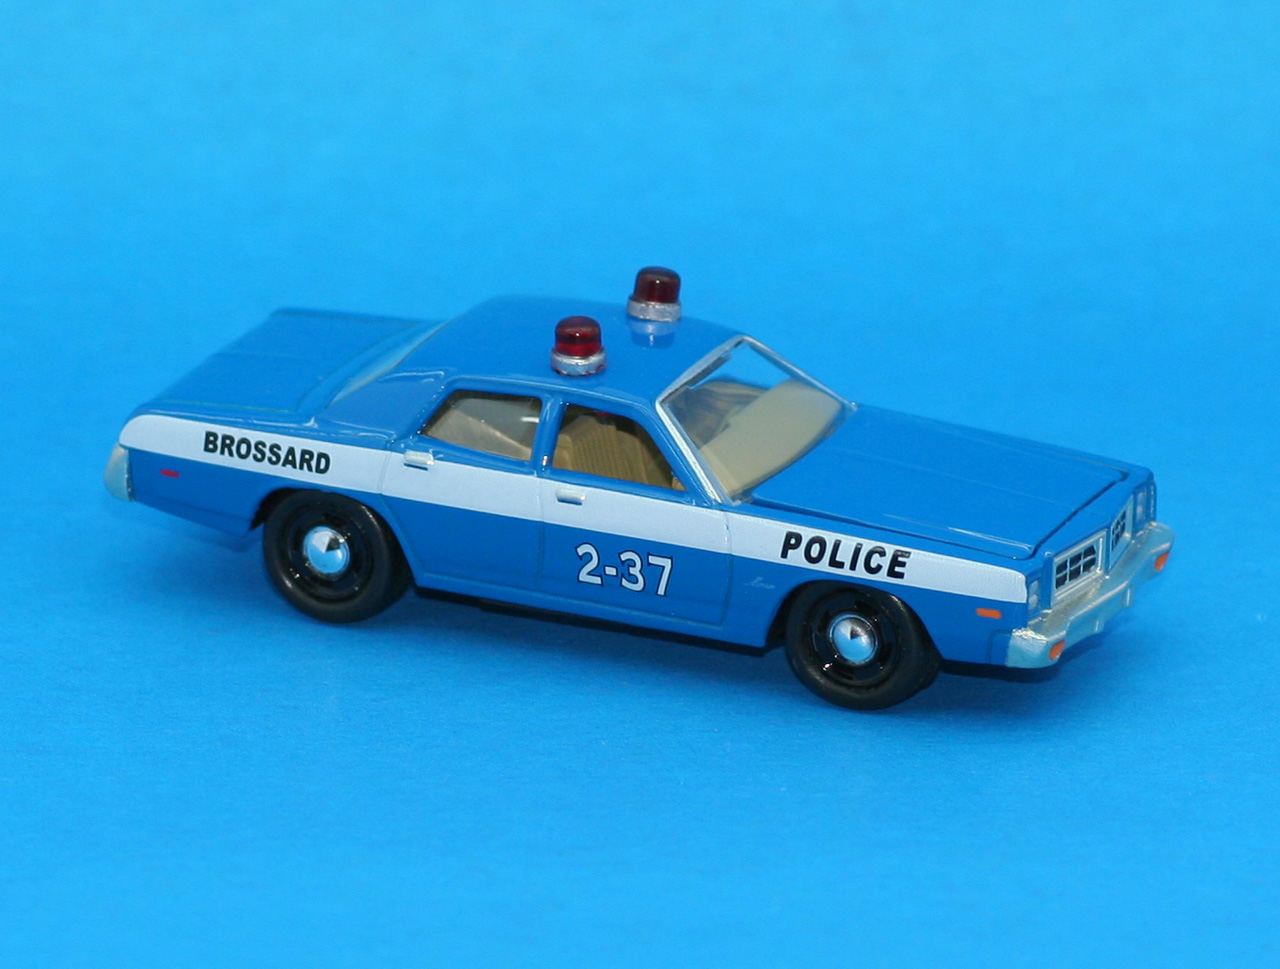 Incredible mini garage dodge monaco 1977 police brossard for Garage mini monaco